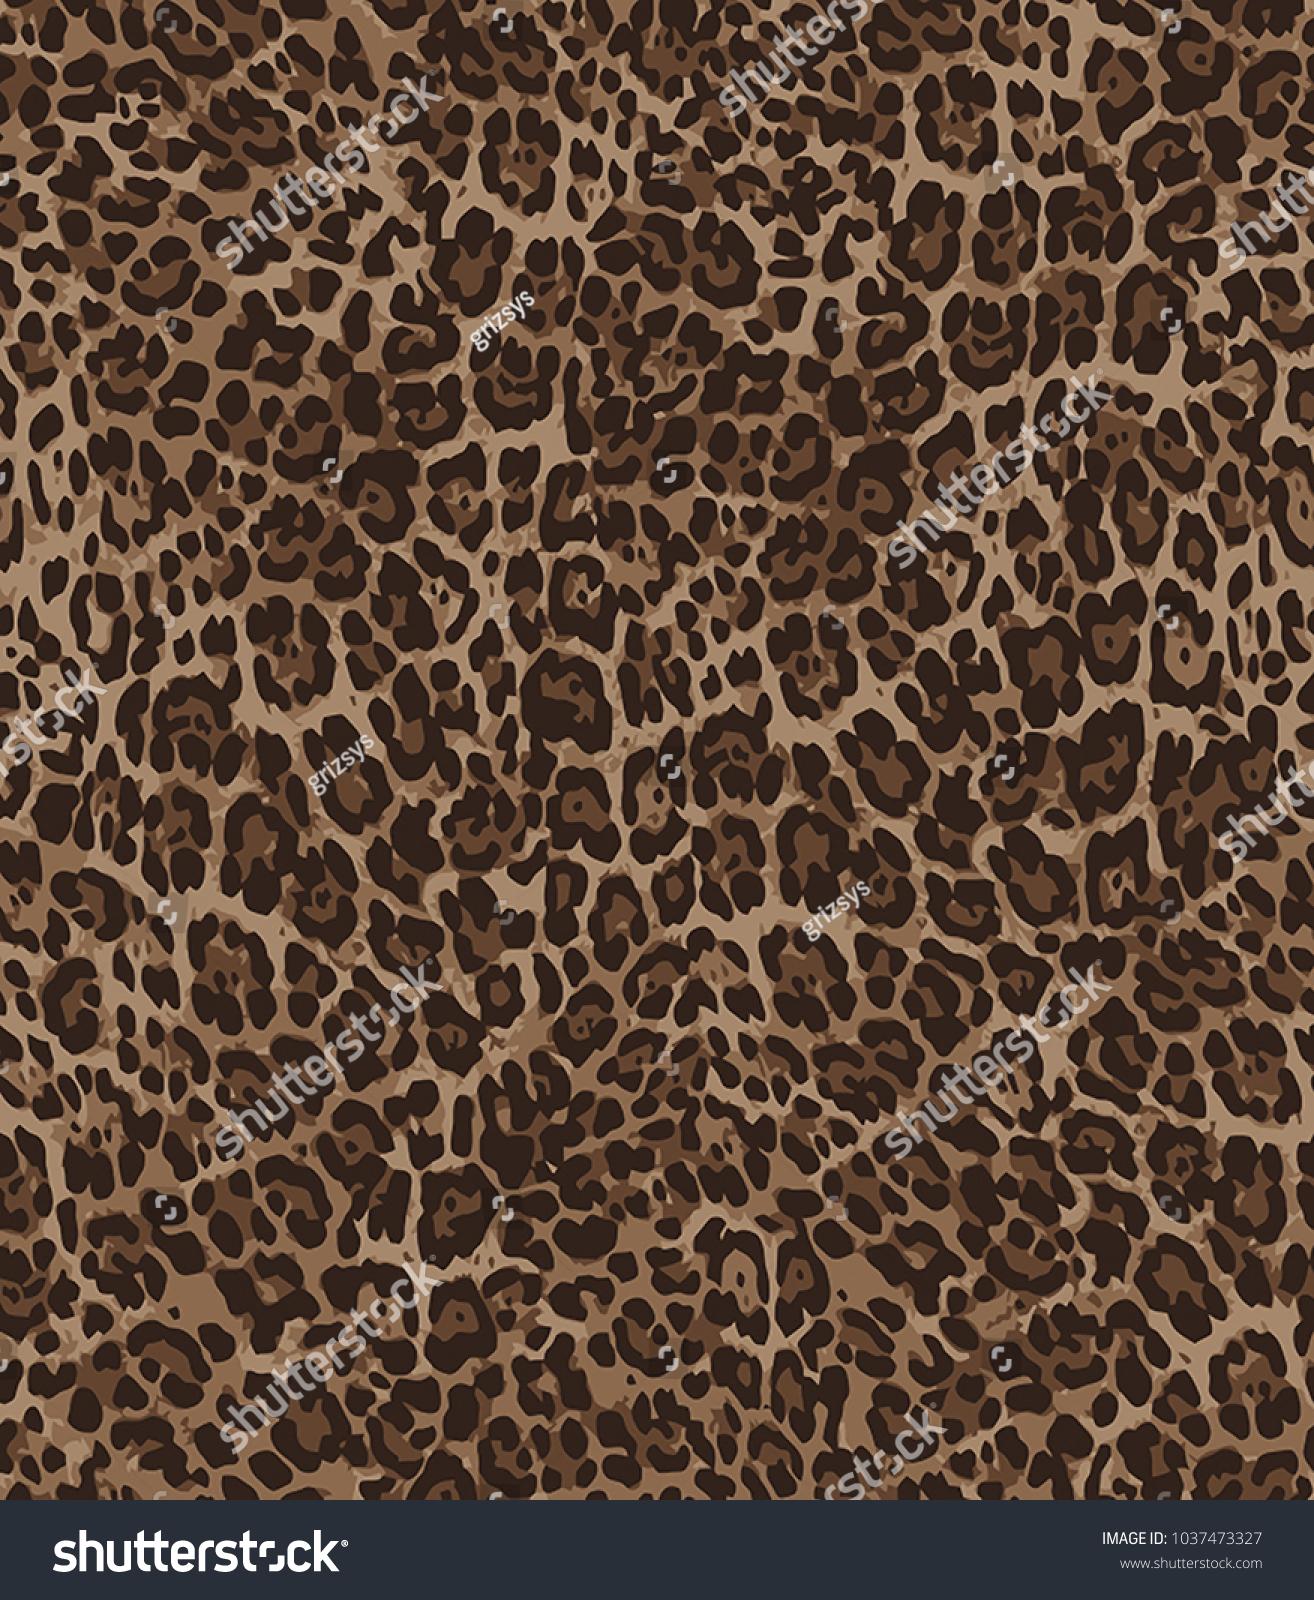 Animal skin leopard pattern in vector